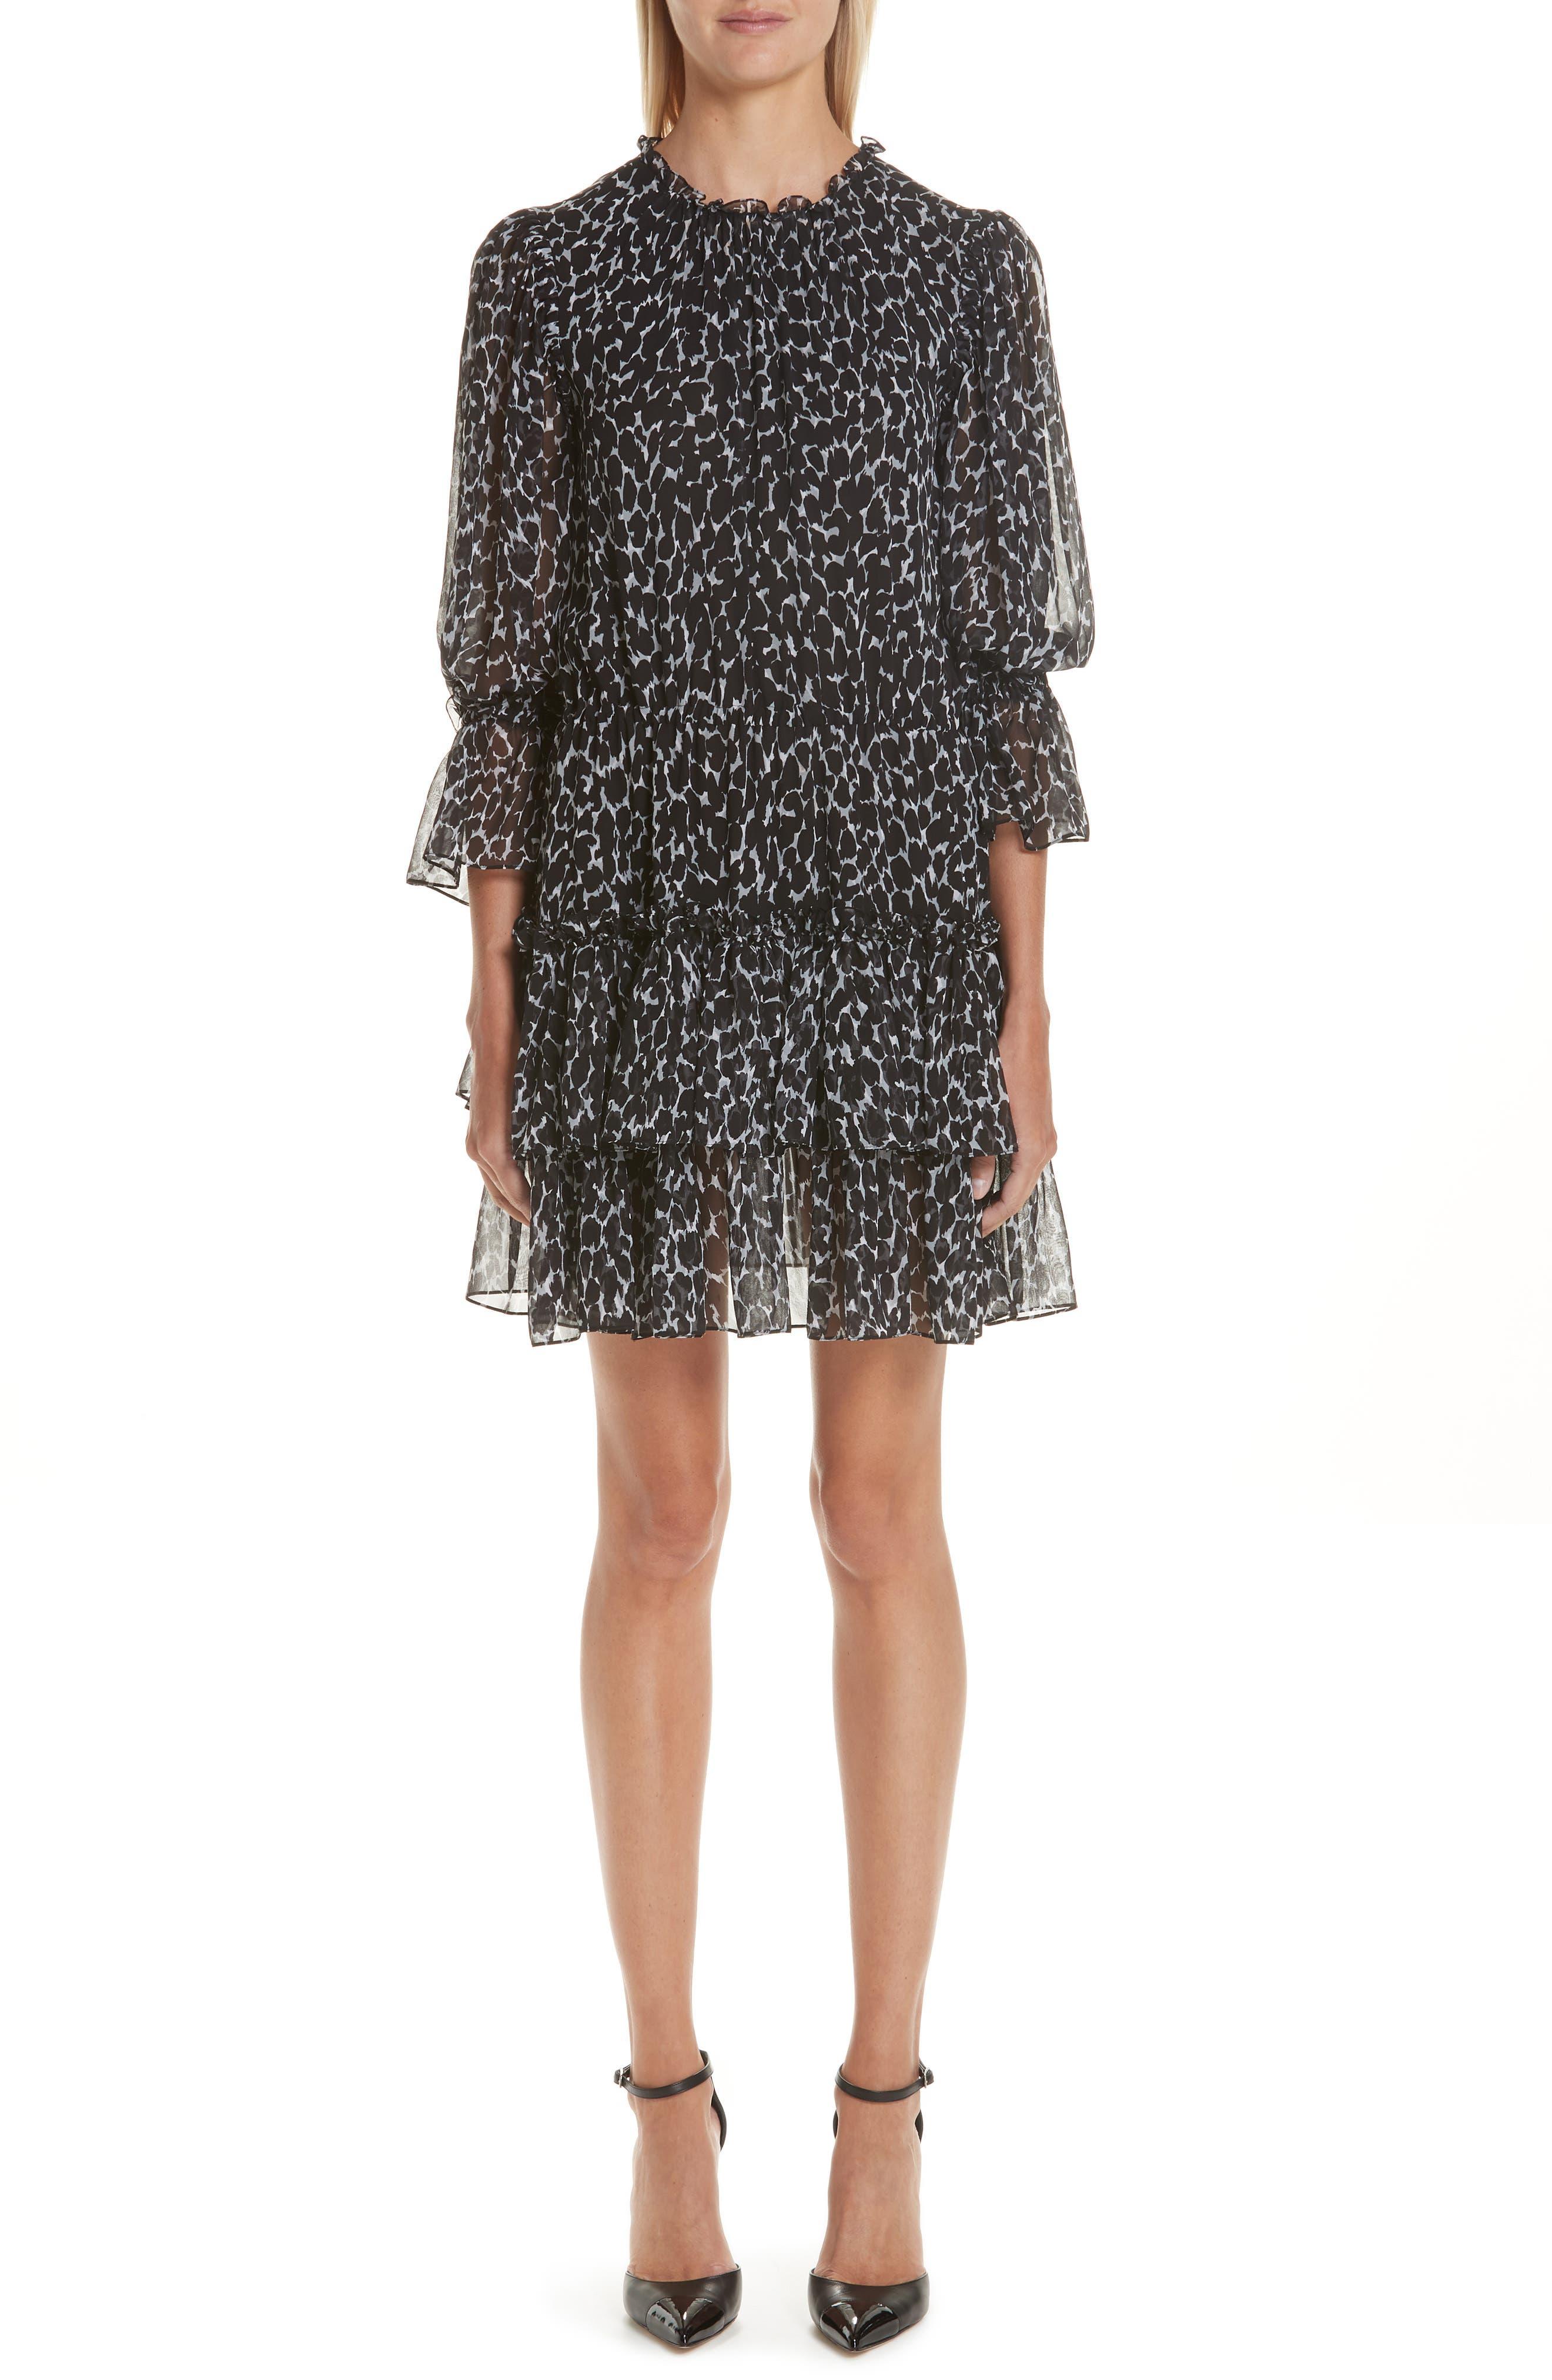 Cheetah-Print Silk Chiffon Tiered Dance Dress in Black Multi